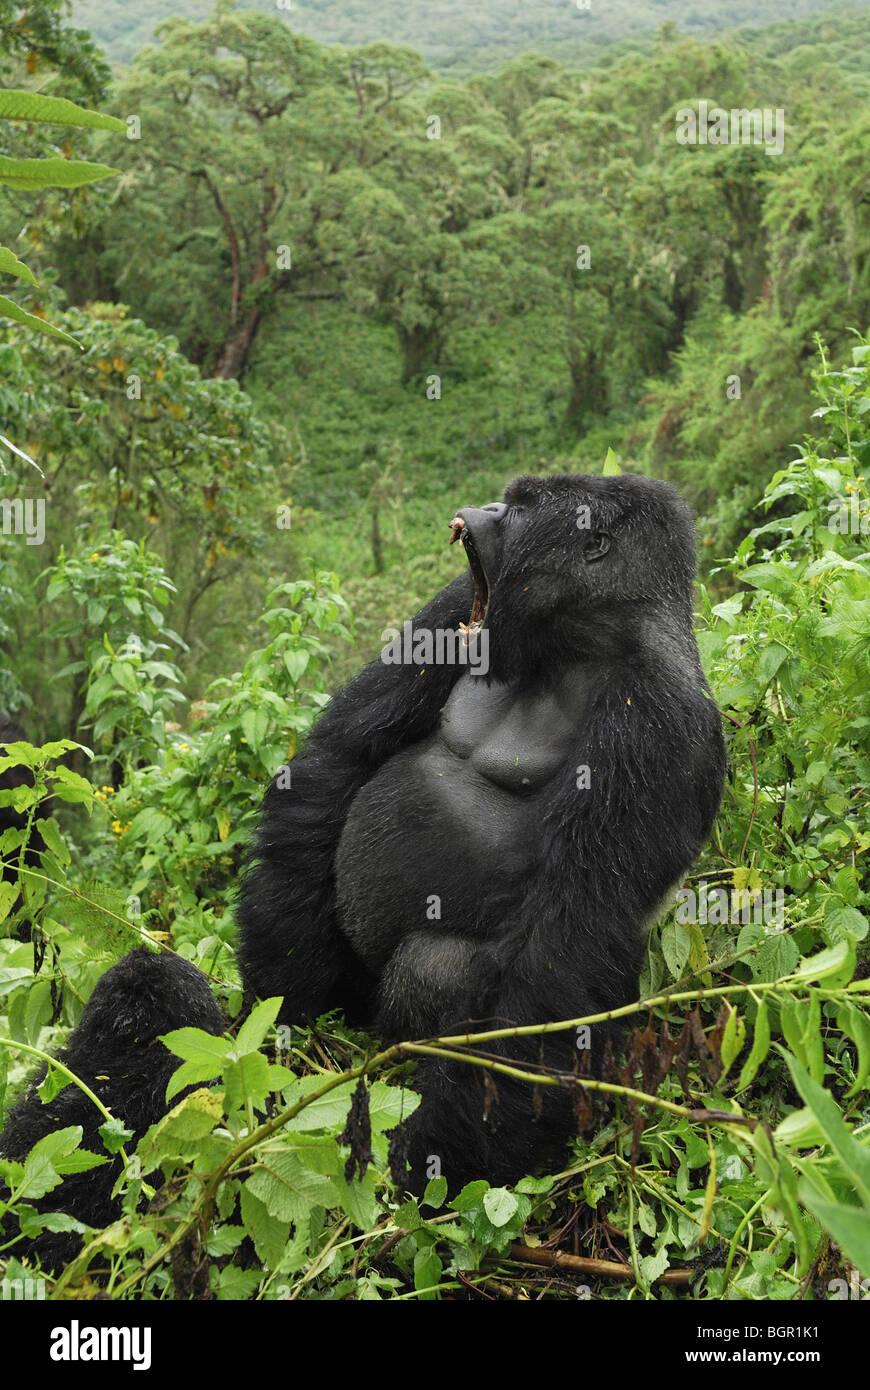 Mountain Gorilla (Gorilla beringei beringei), Silverback with open mouth, Volcanoes National Park, Rwanda - Stock Image